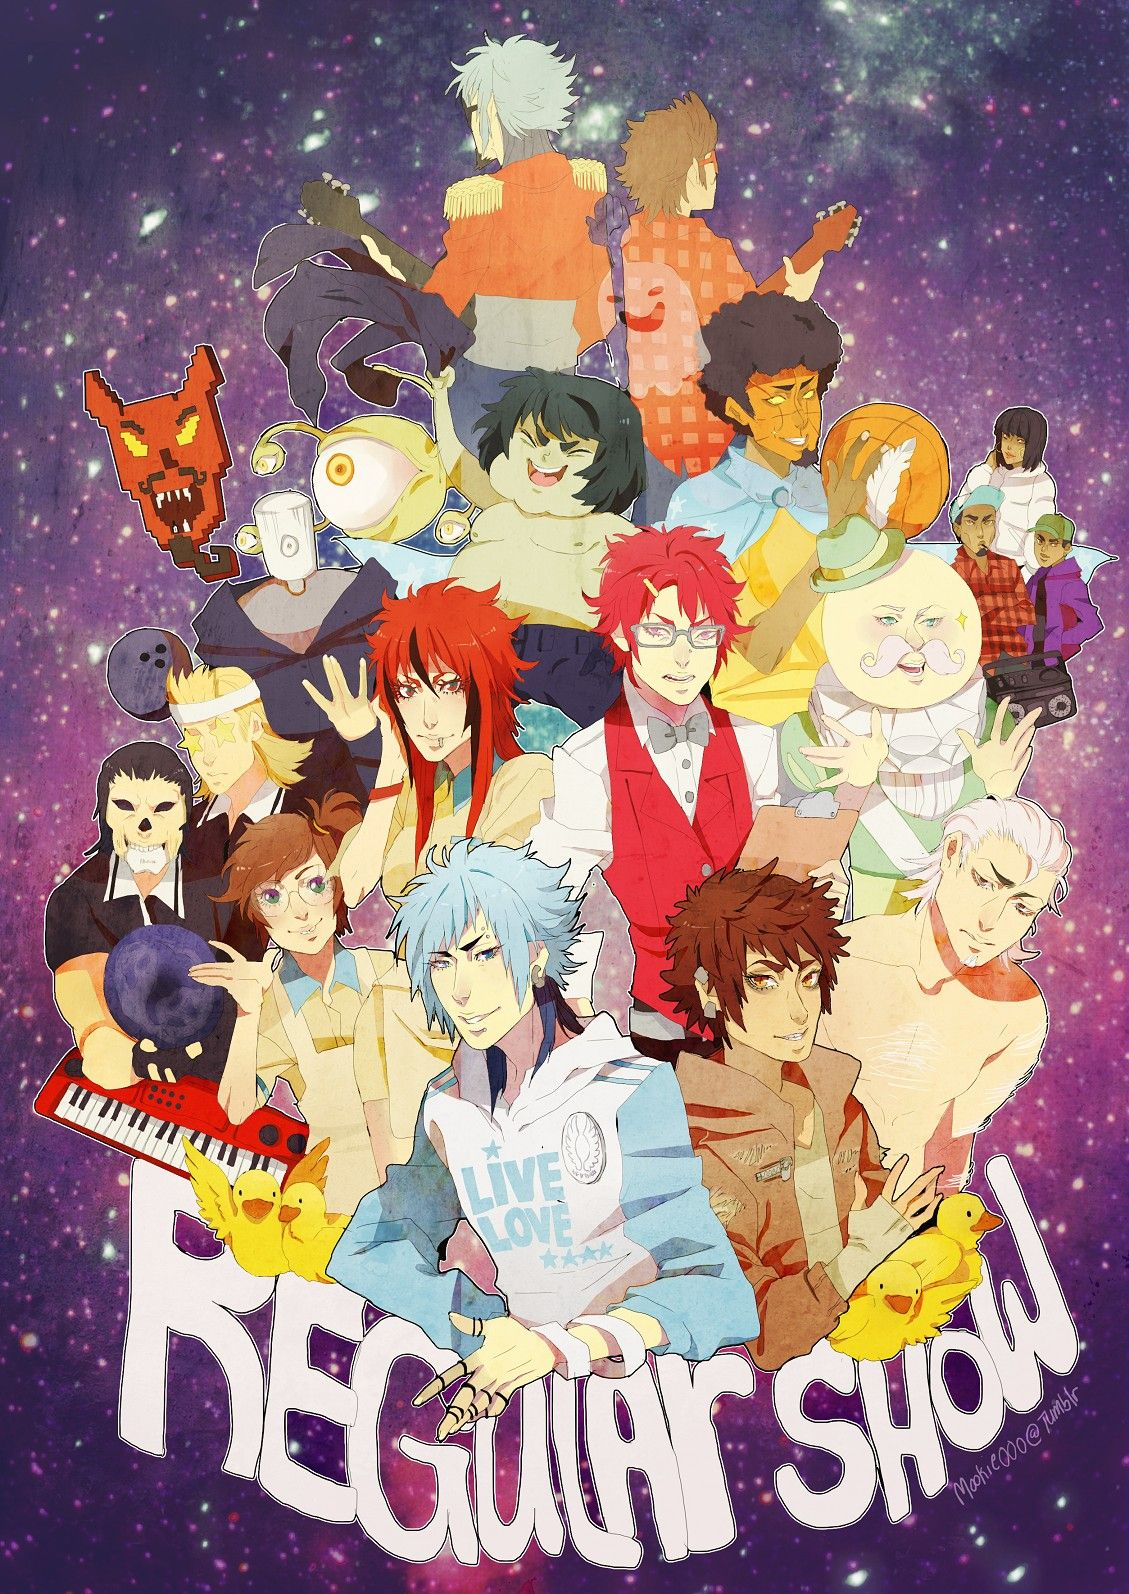 Anime version of regular show